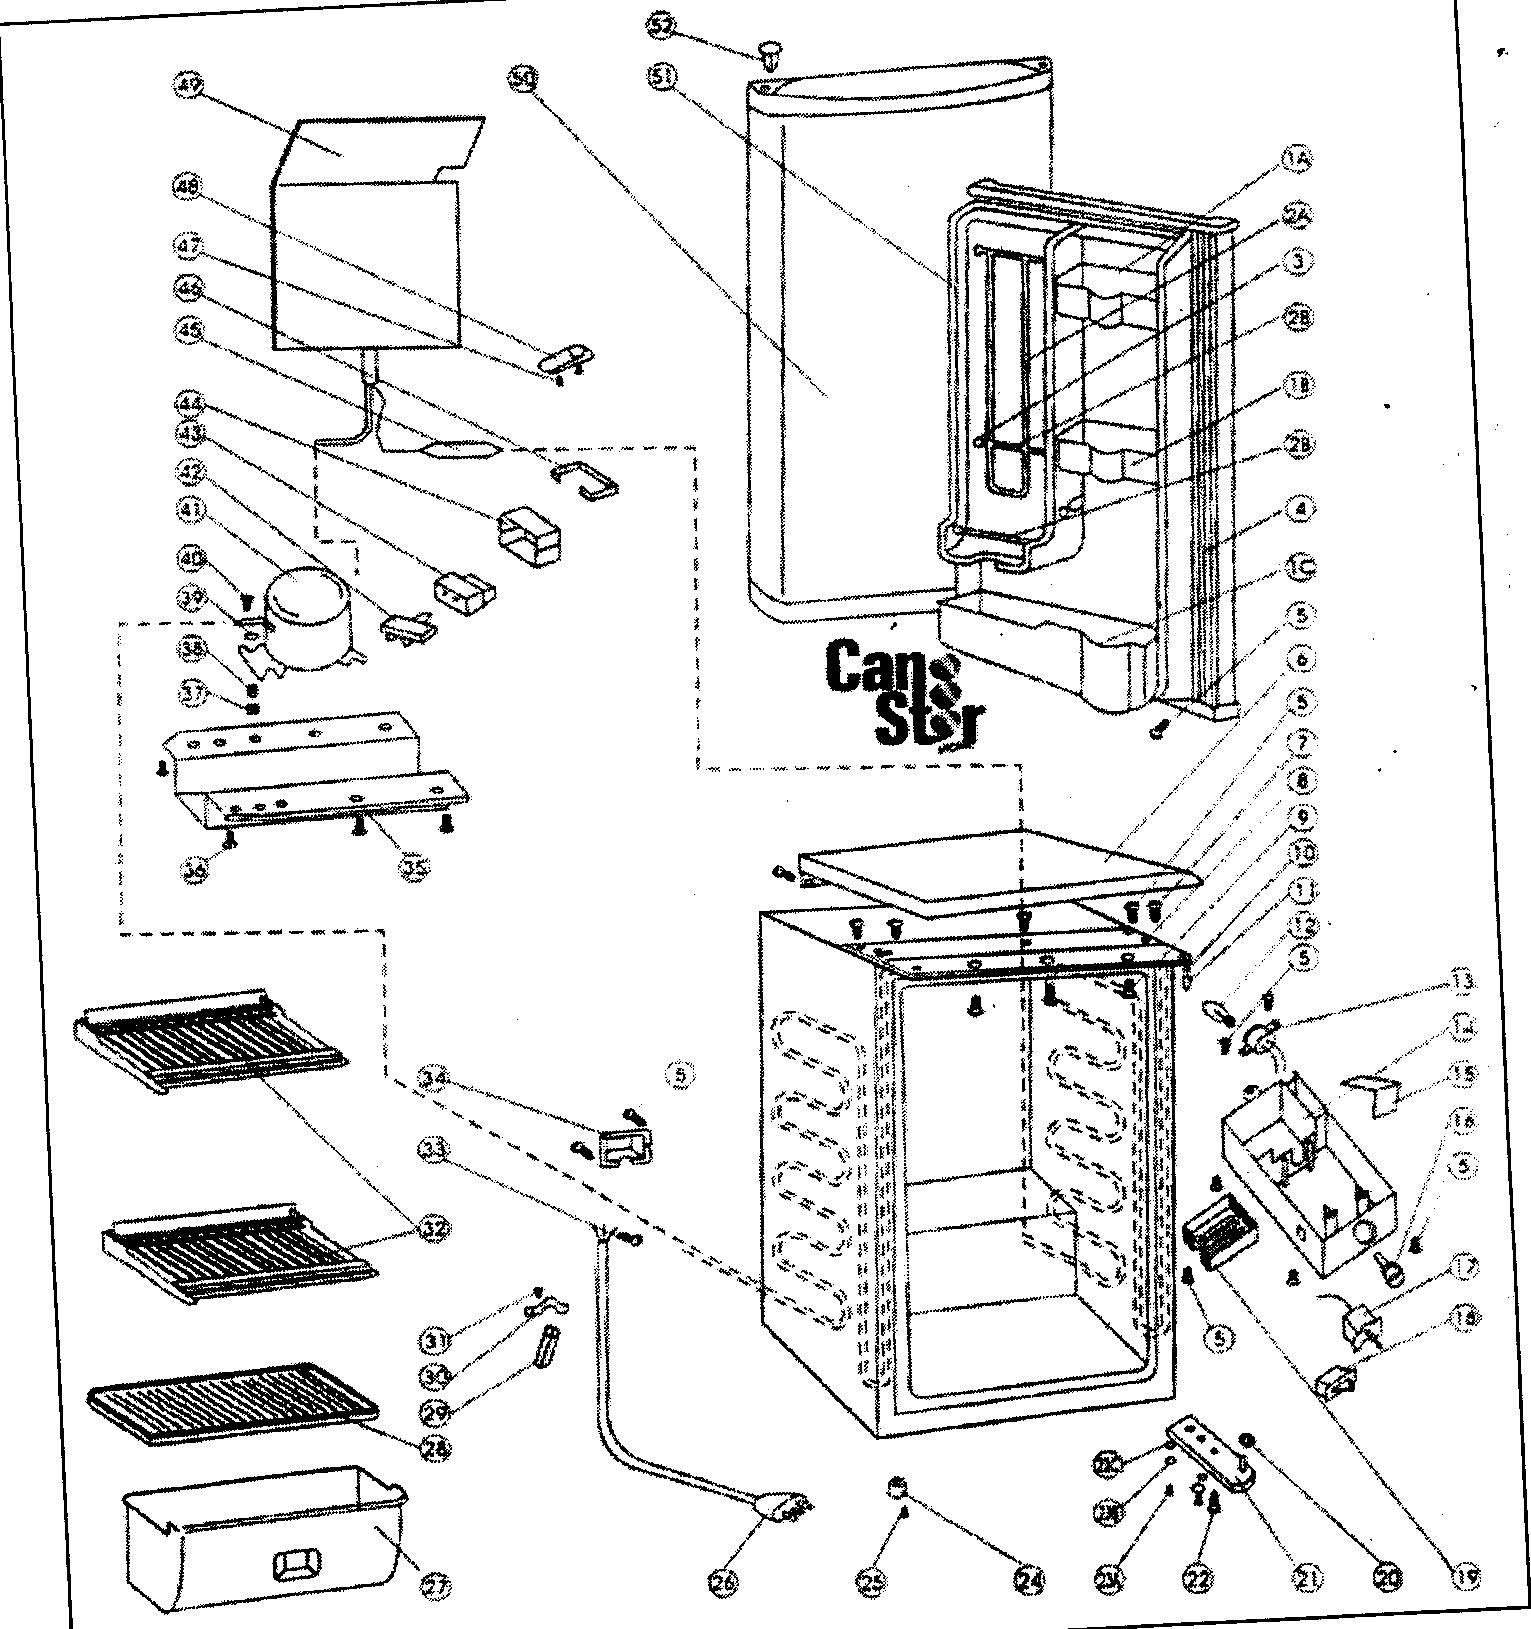 Danby model DAR452BL under counter refrigerator genuine parts